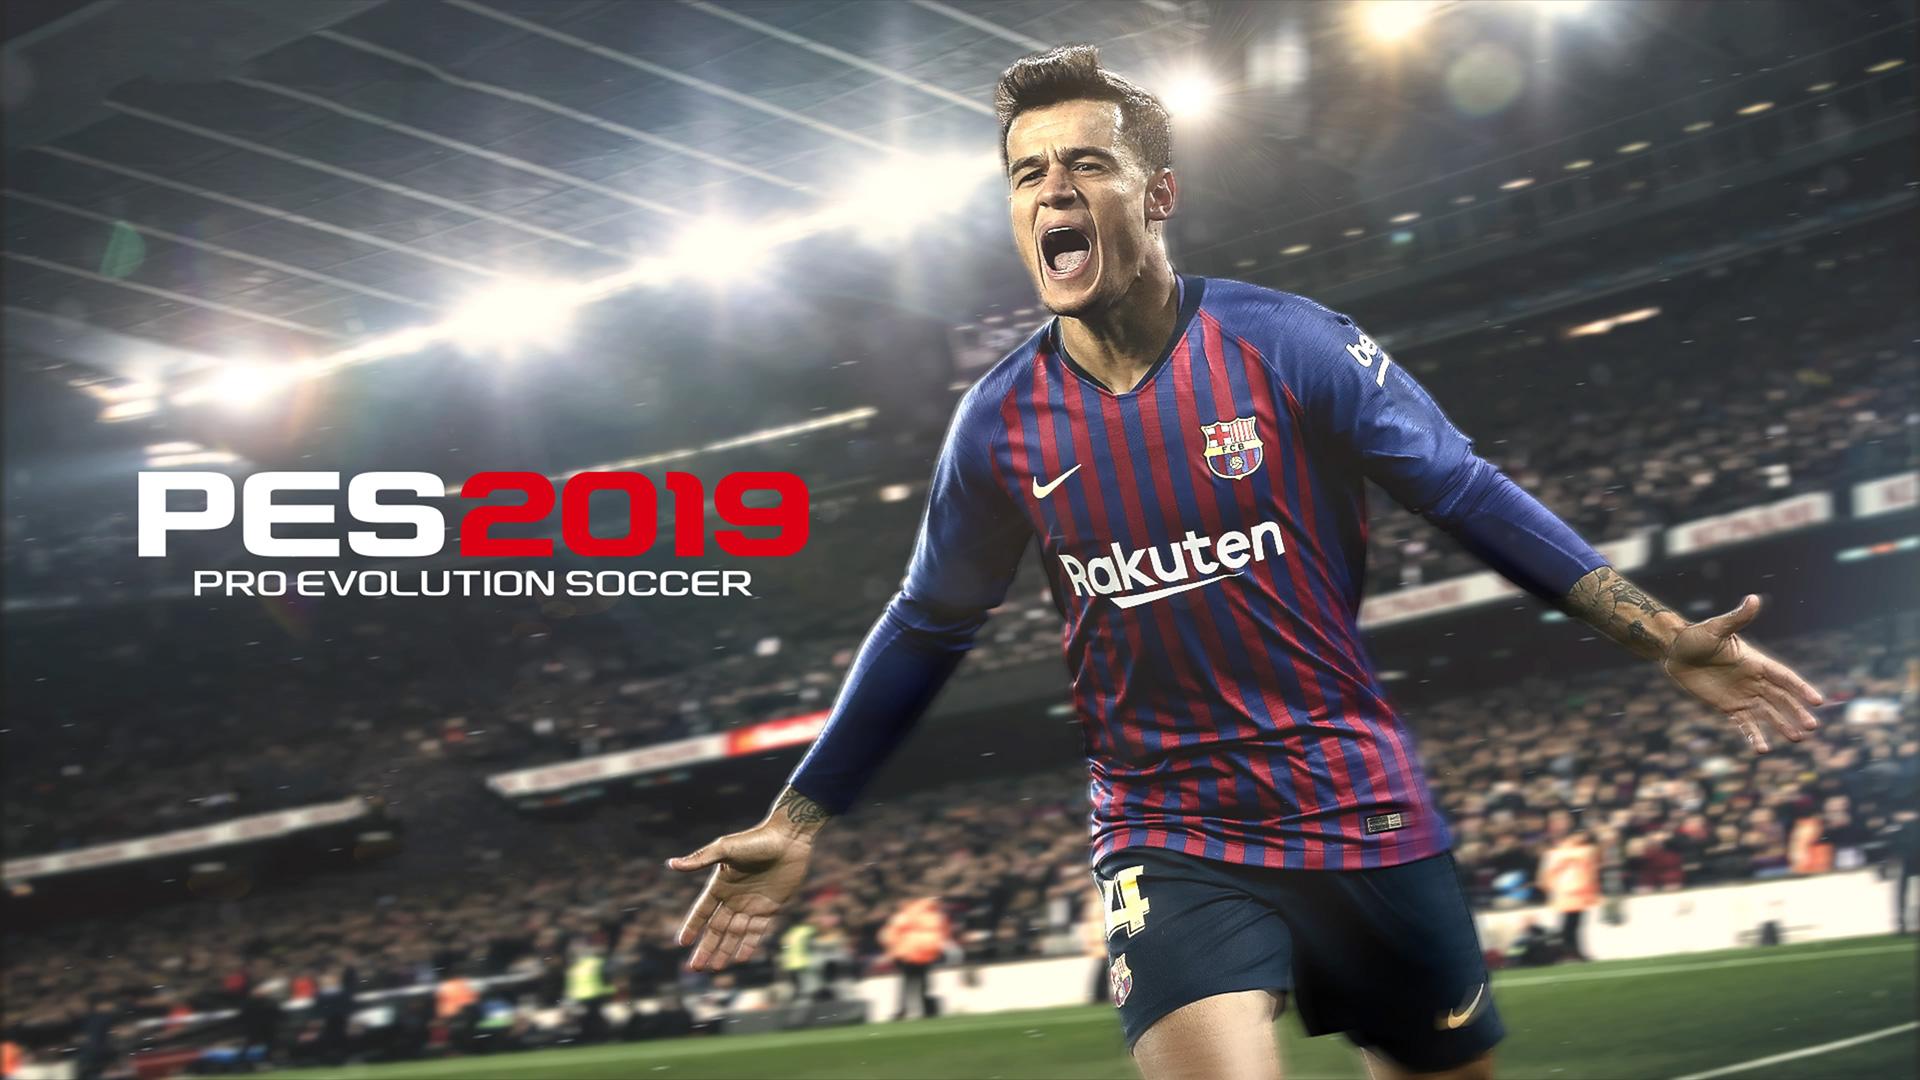 Soccer Iphone Wallpaper Hd Pro Evolution Soccer 2019 Wallpapers In Ultra Hd 4k